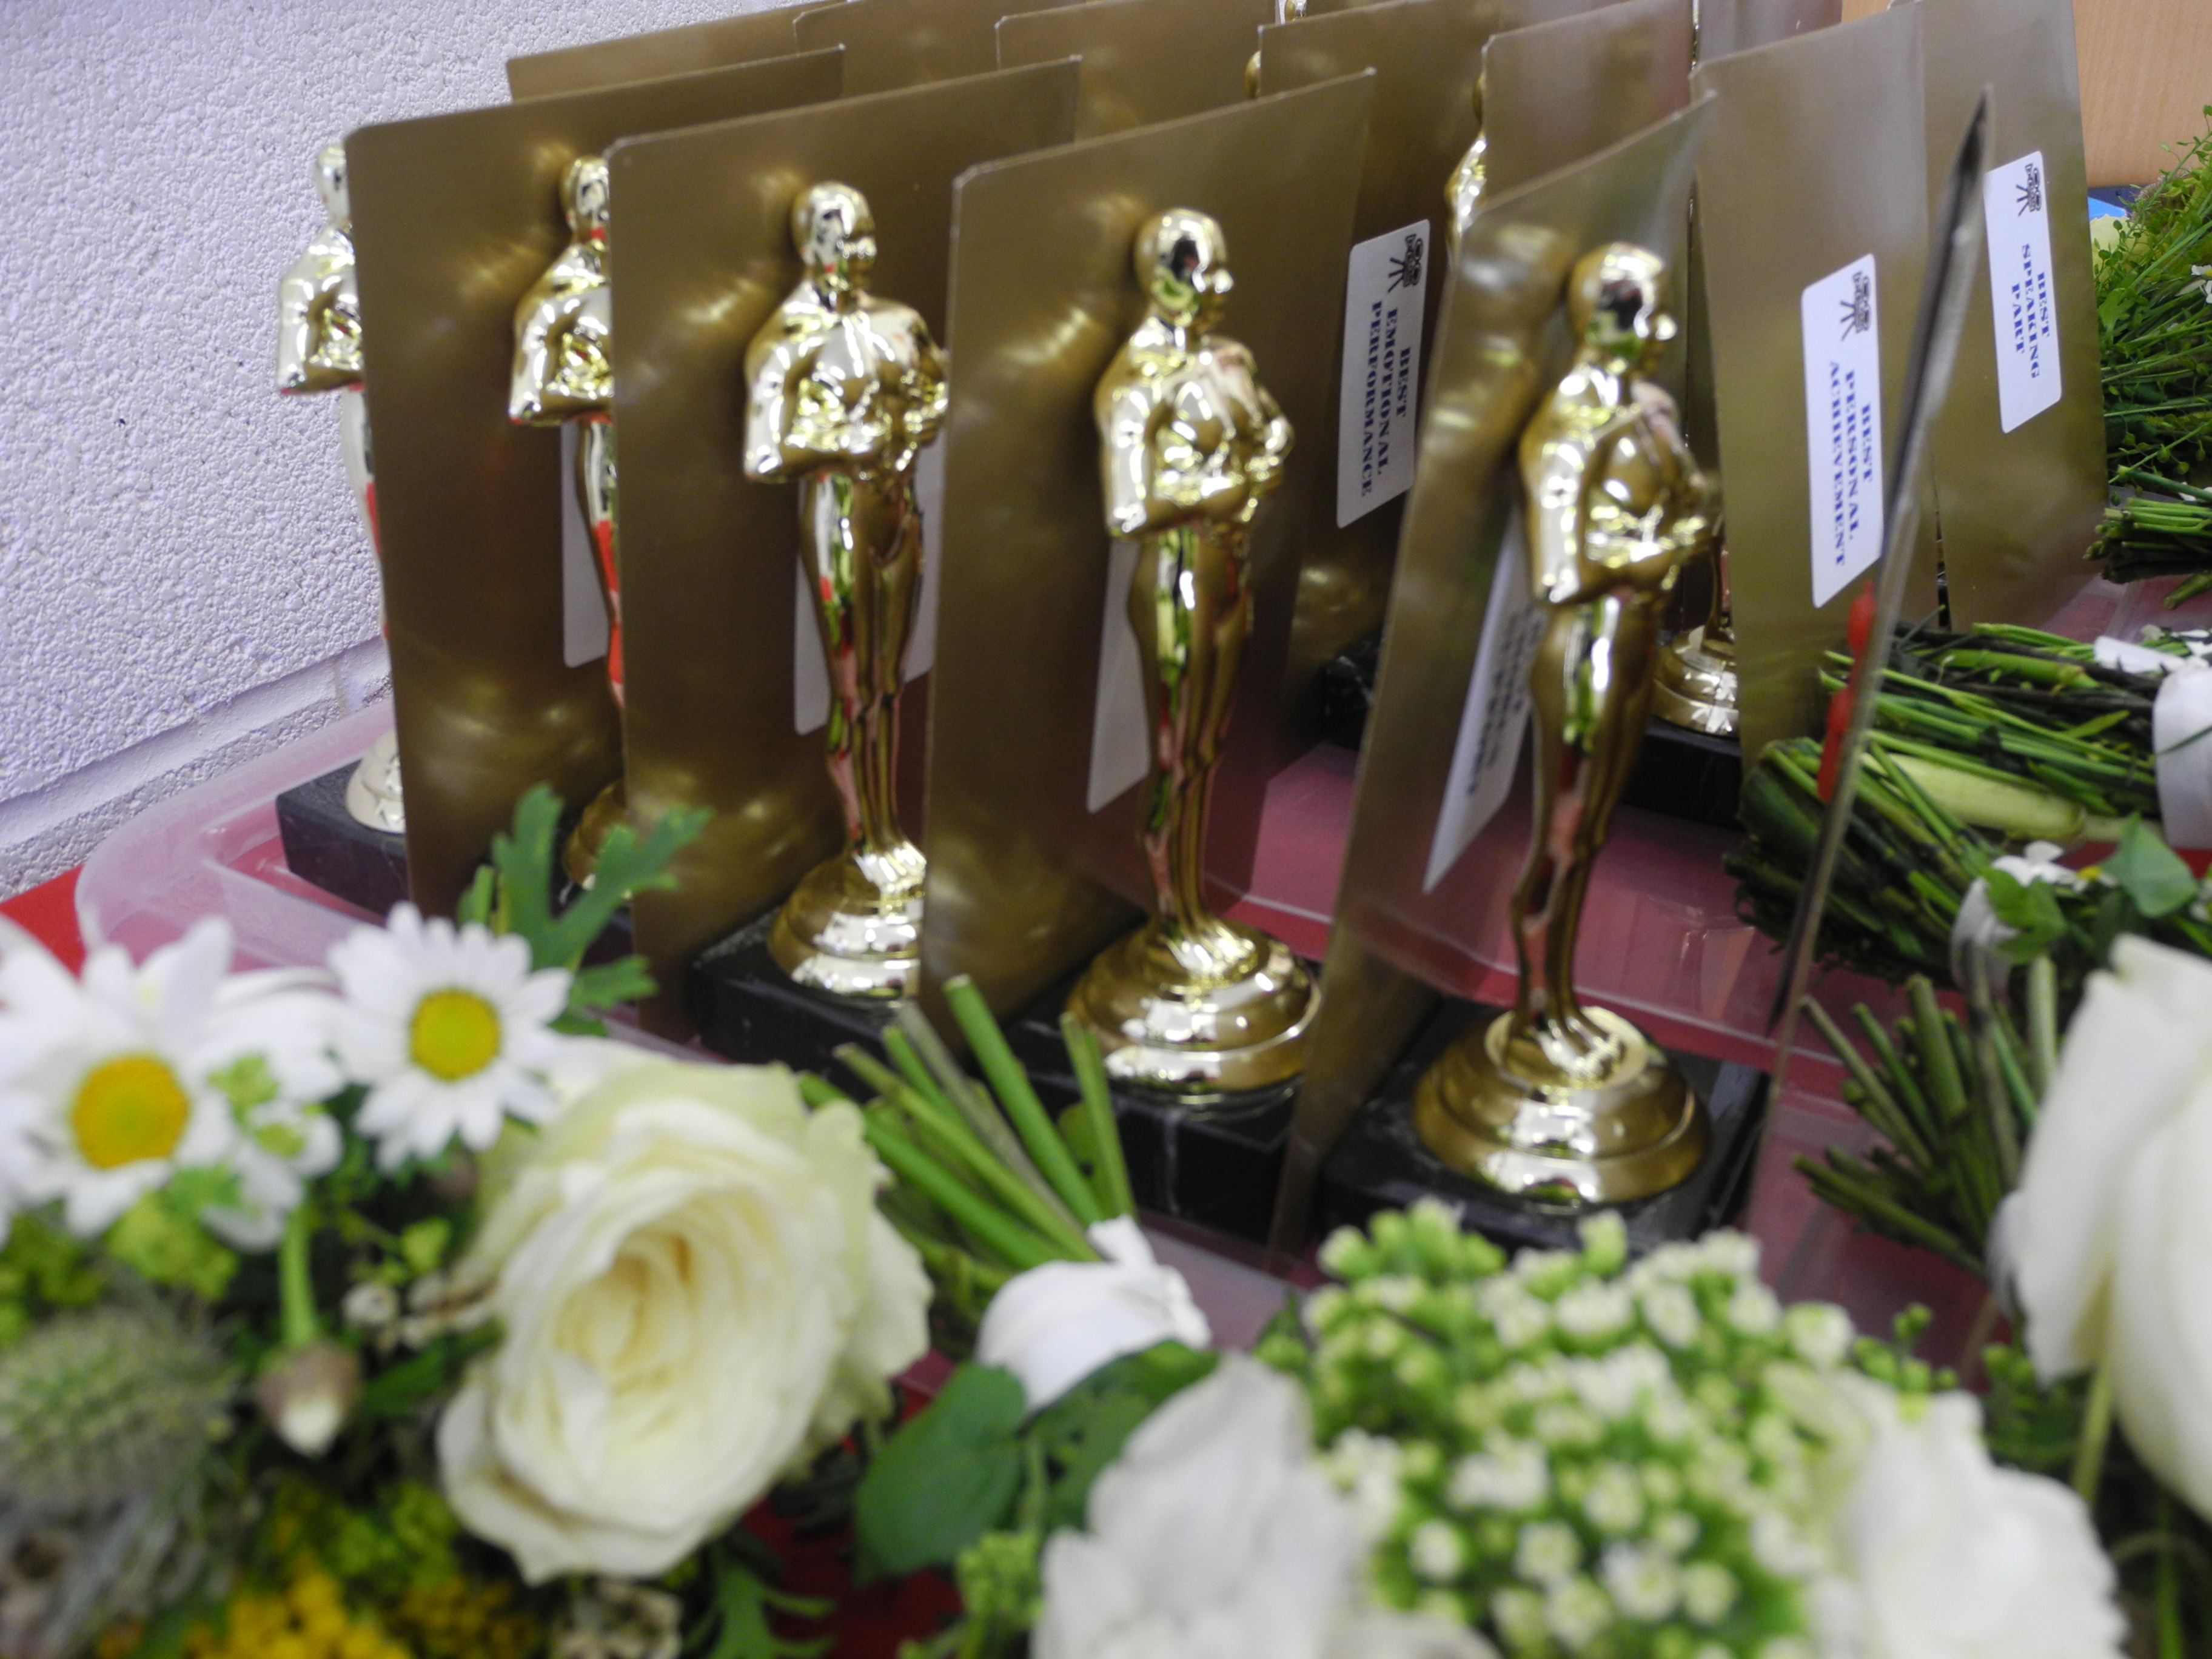 Oscars night Film Cuts celebration